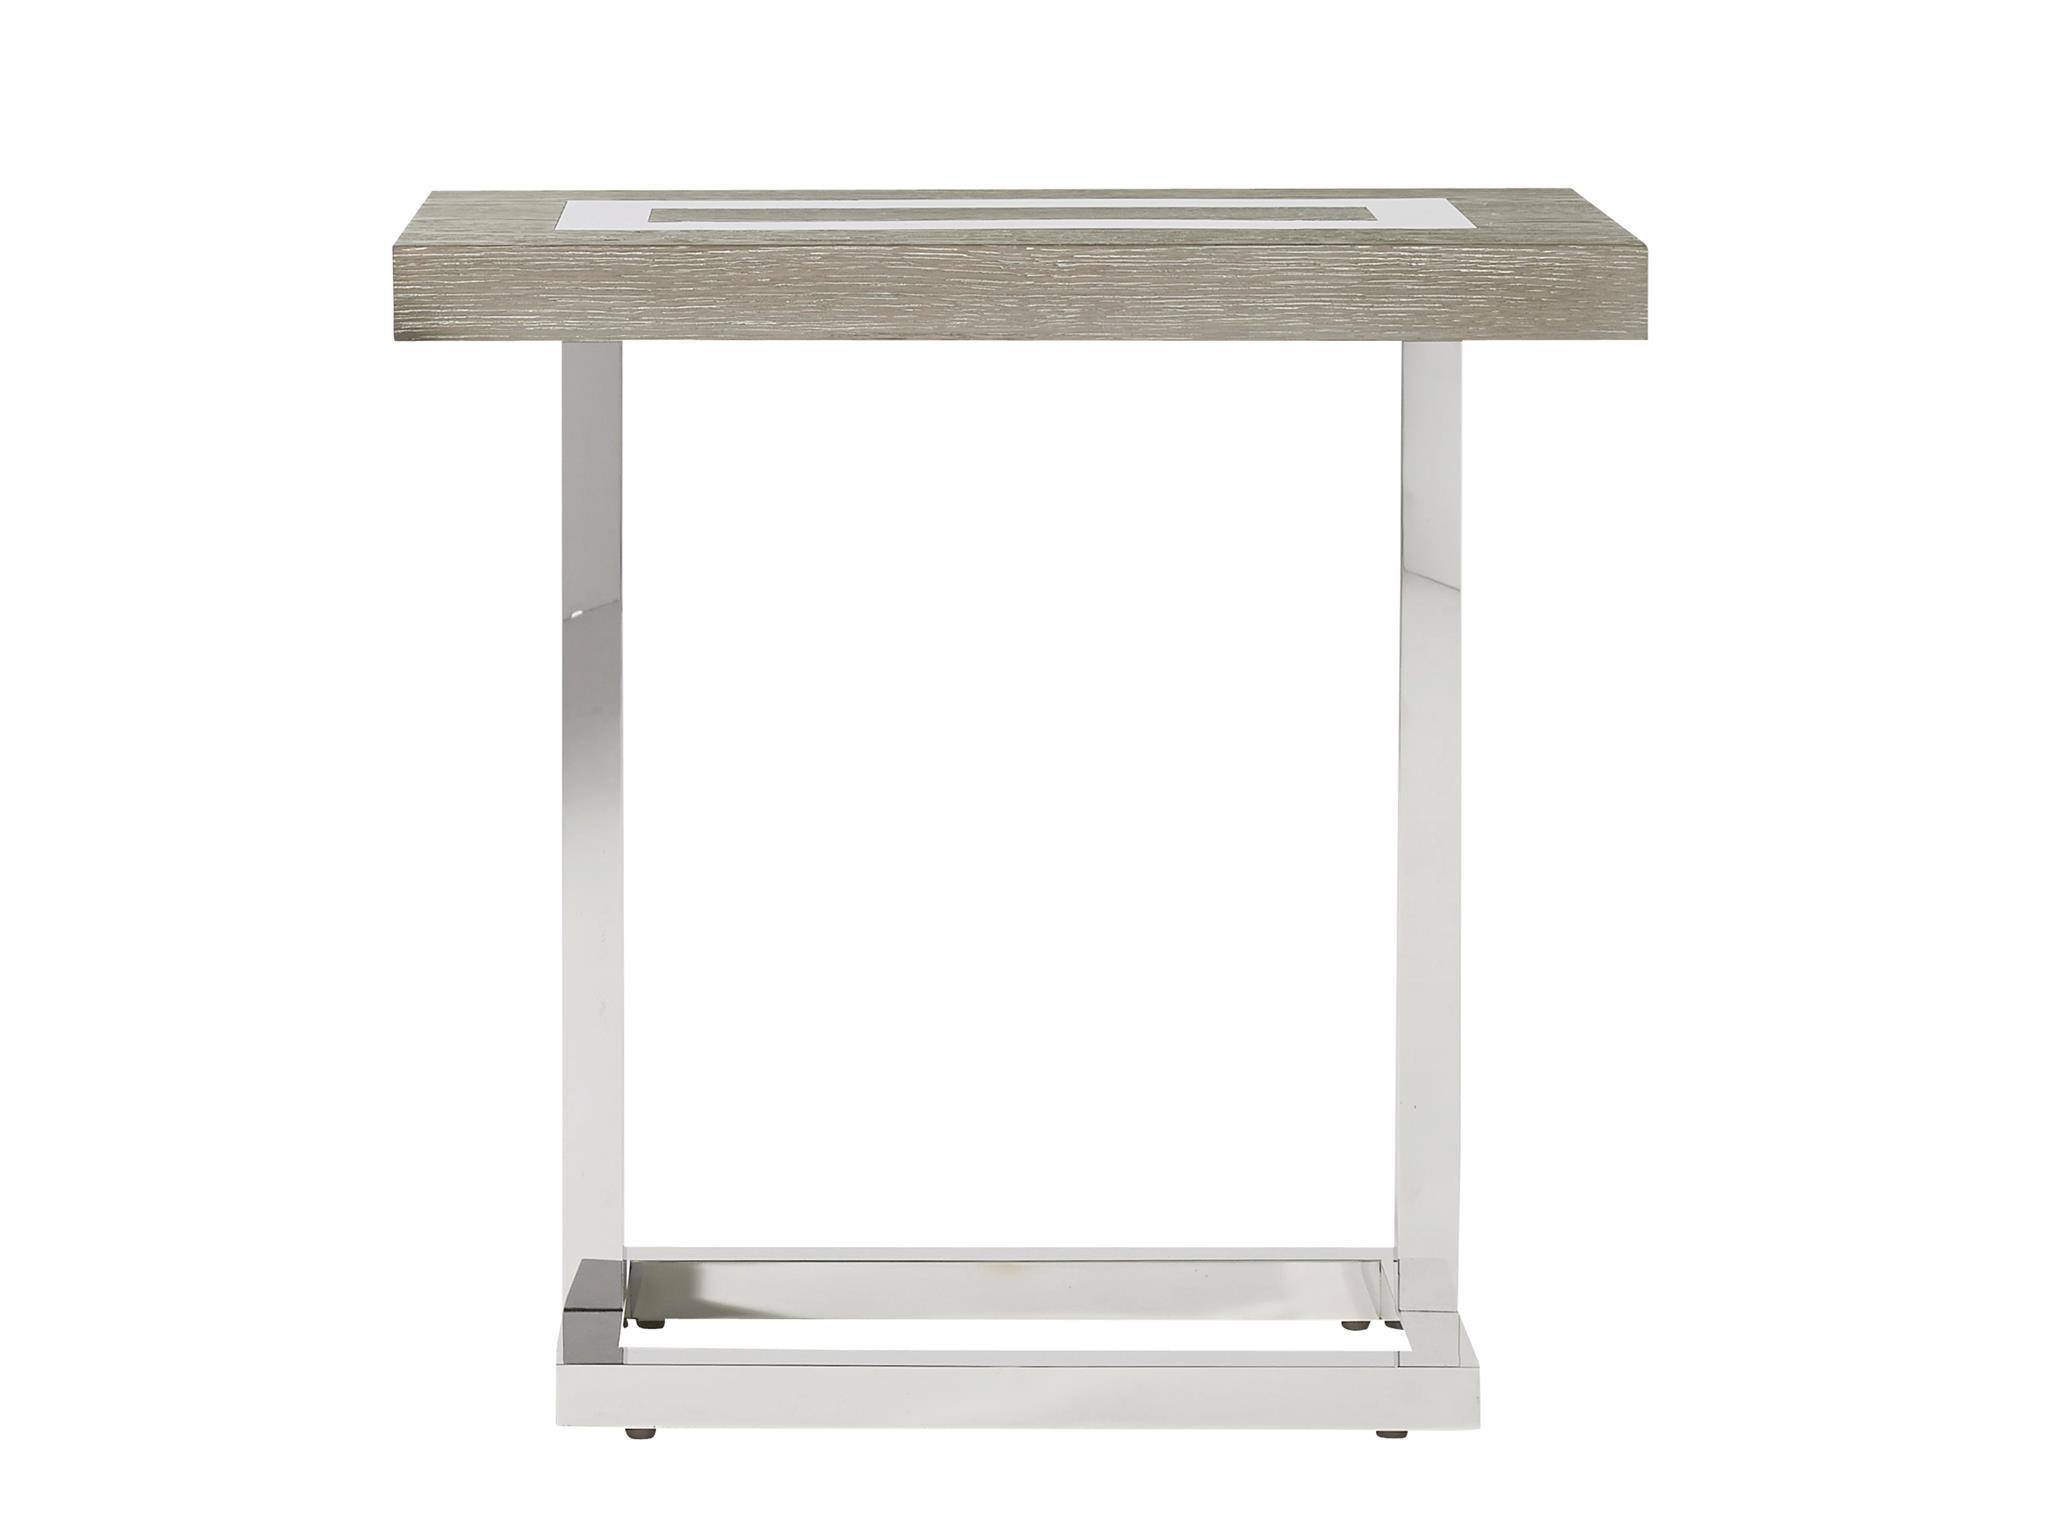 645817. Wyatt Chair Side Table